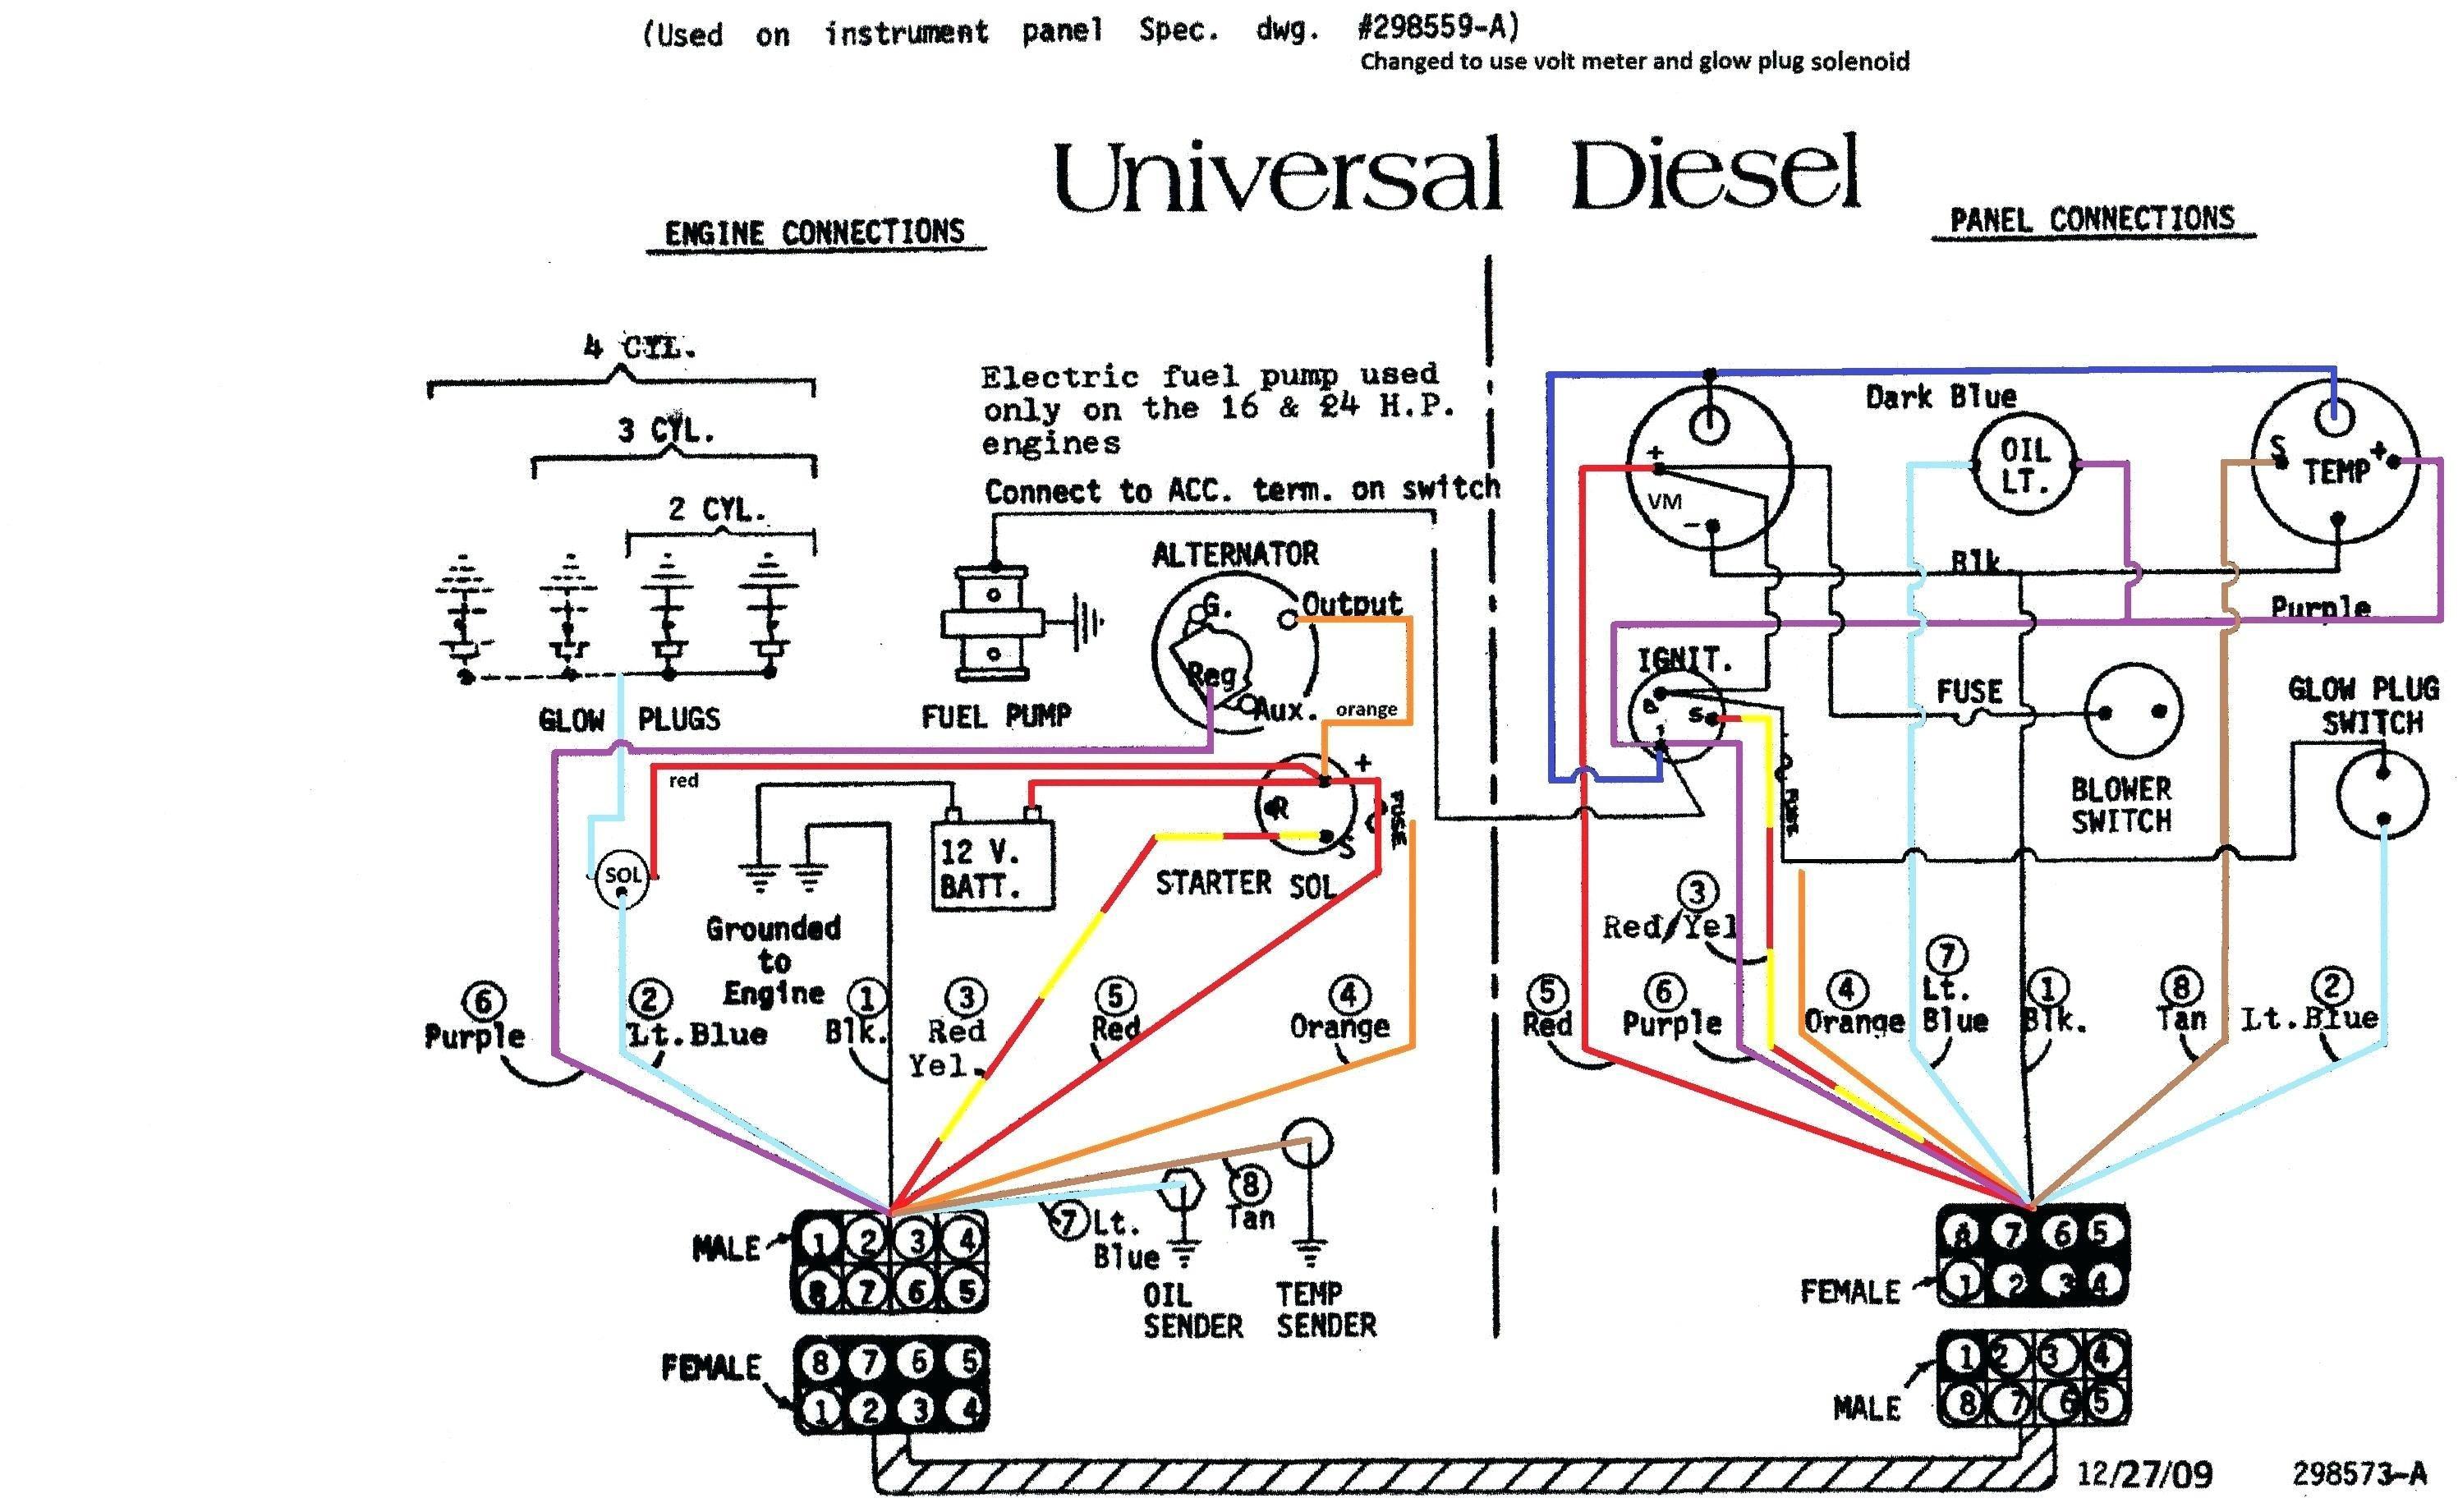 Wiring Diagram For Cs130 Alternator Fresh 3 Wire Alternator Wiring Diagram Diagram Delcoy Wire Alternator